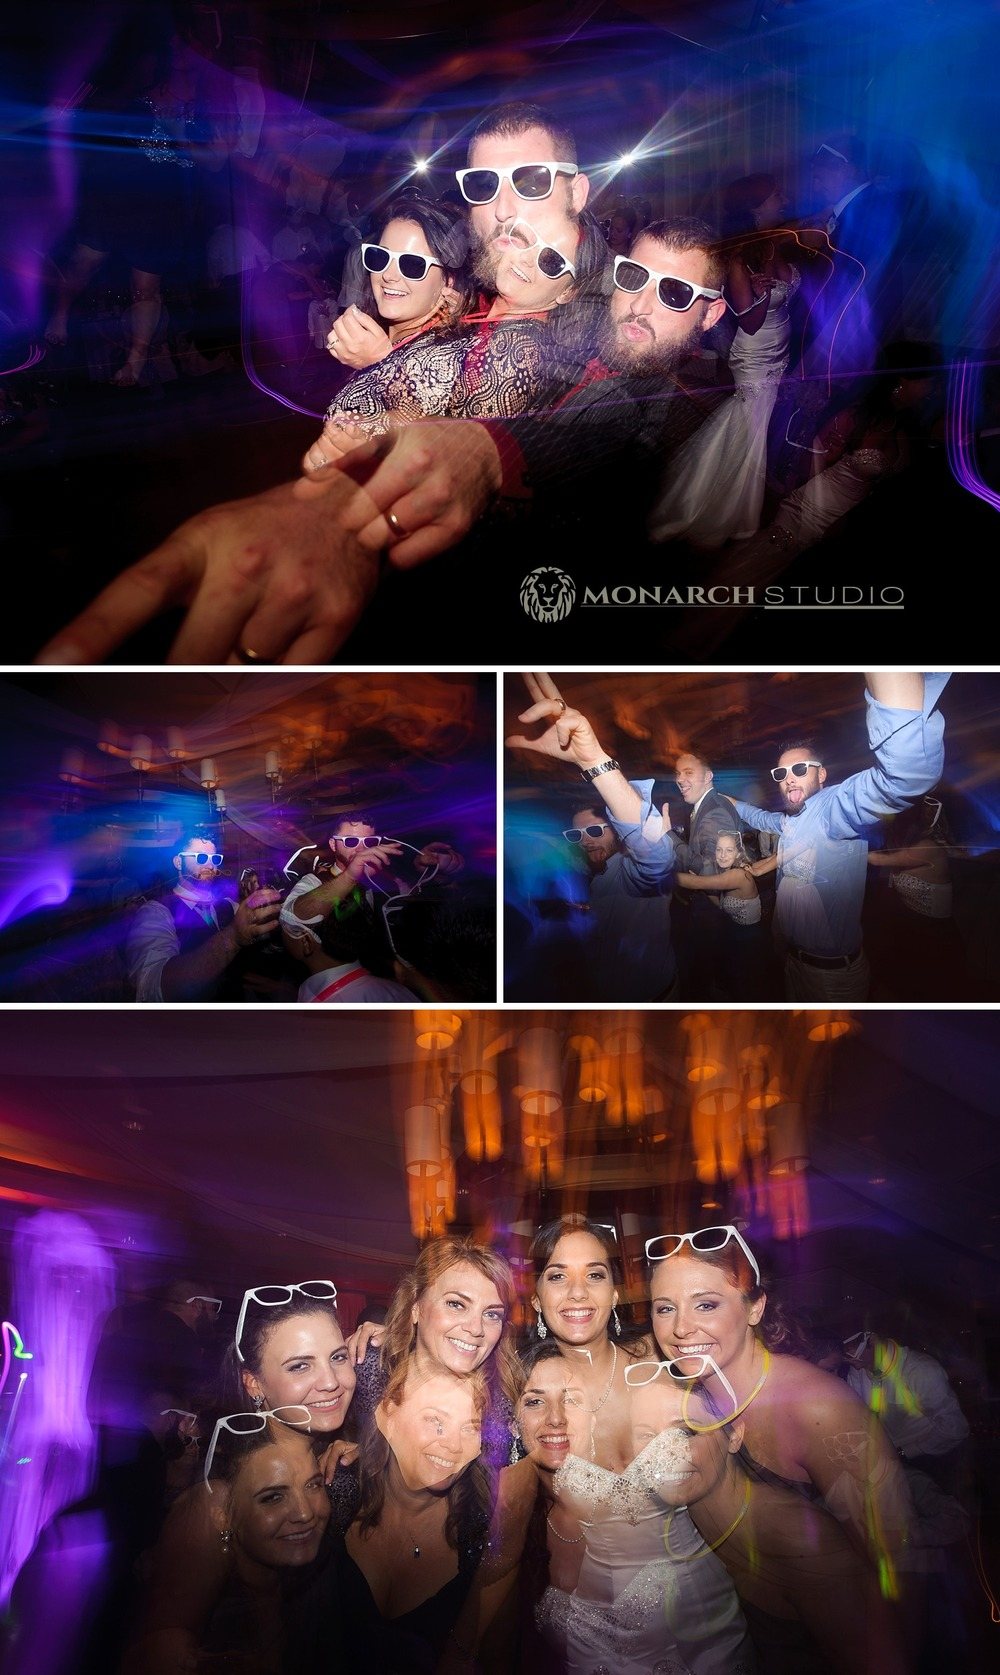 Palm-Coast-Wedding-Photographer-Monarch-Studio_0143.jpg